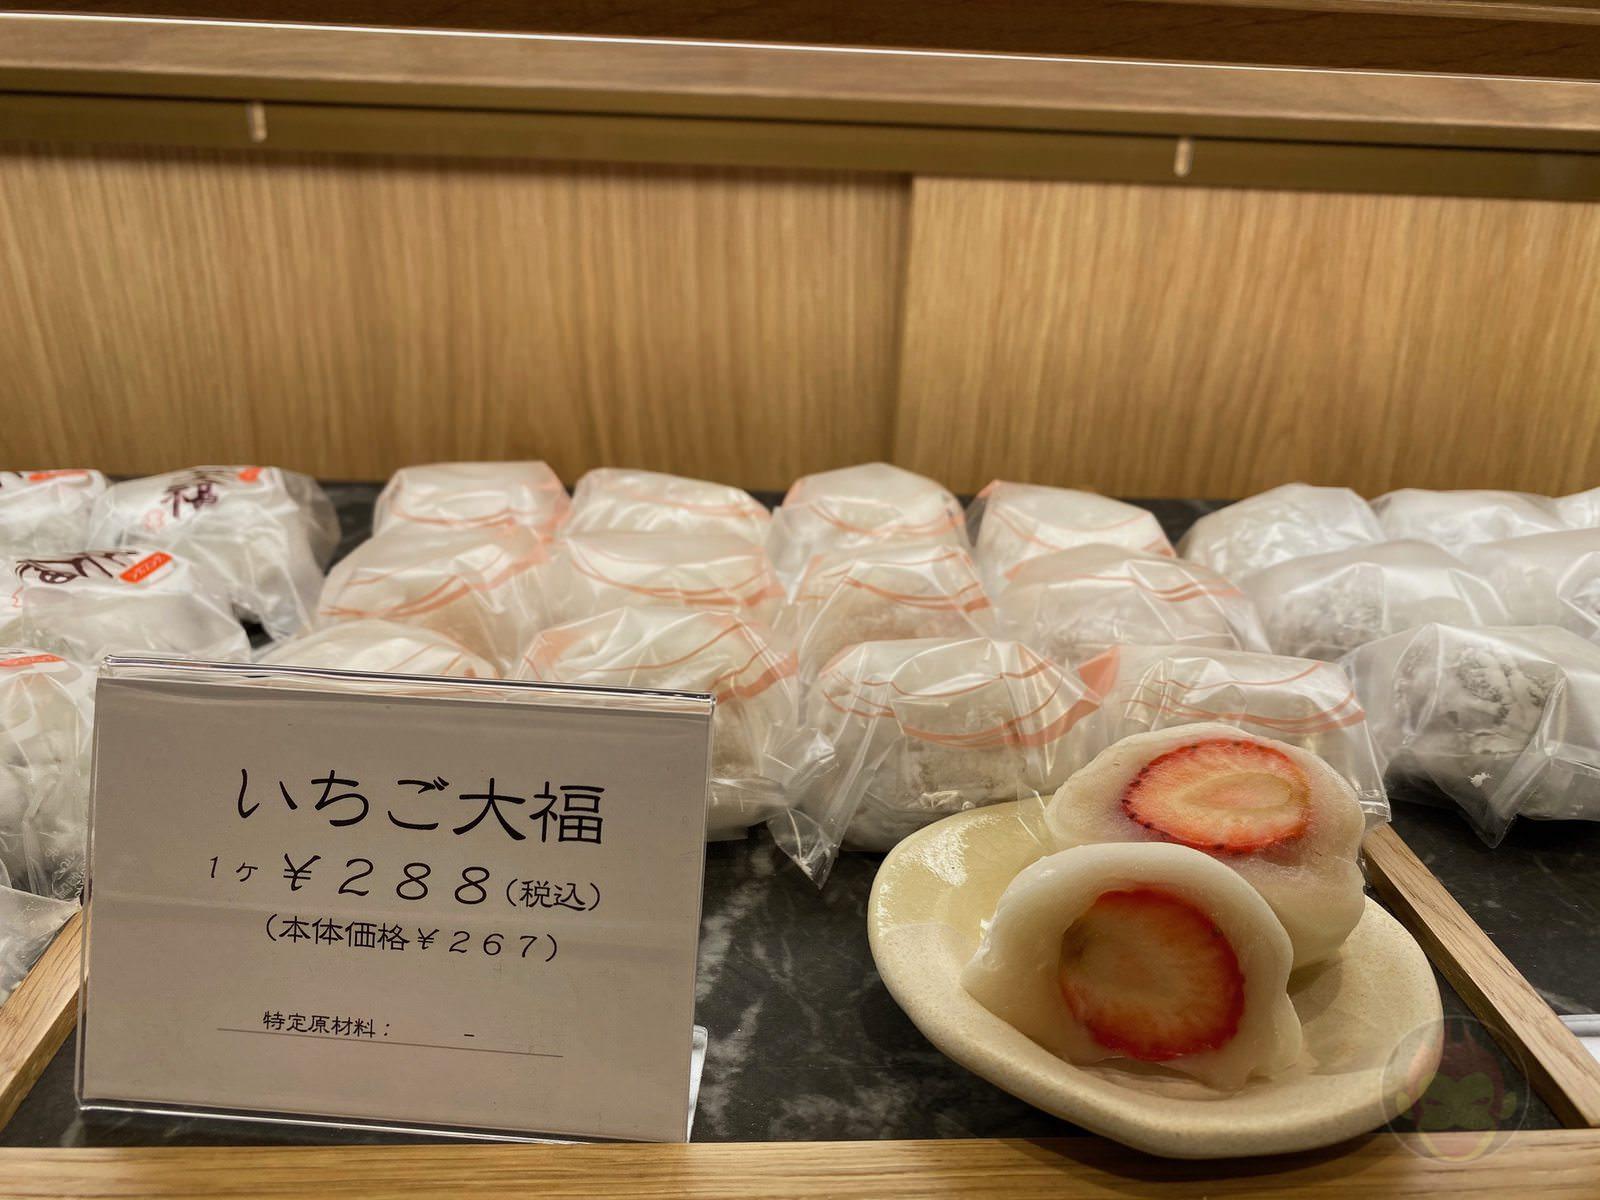 Shibuya-Scramble-Square-Food-I-Ate-38.jpeg